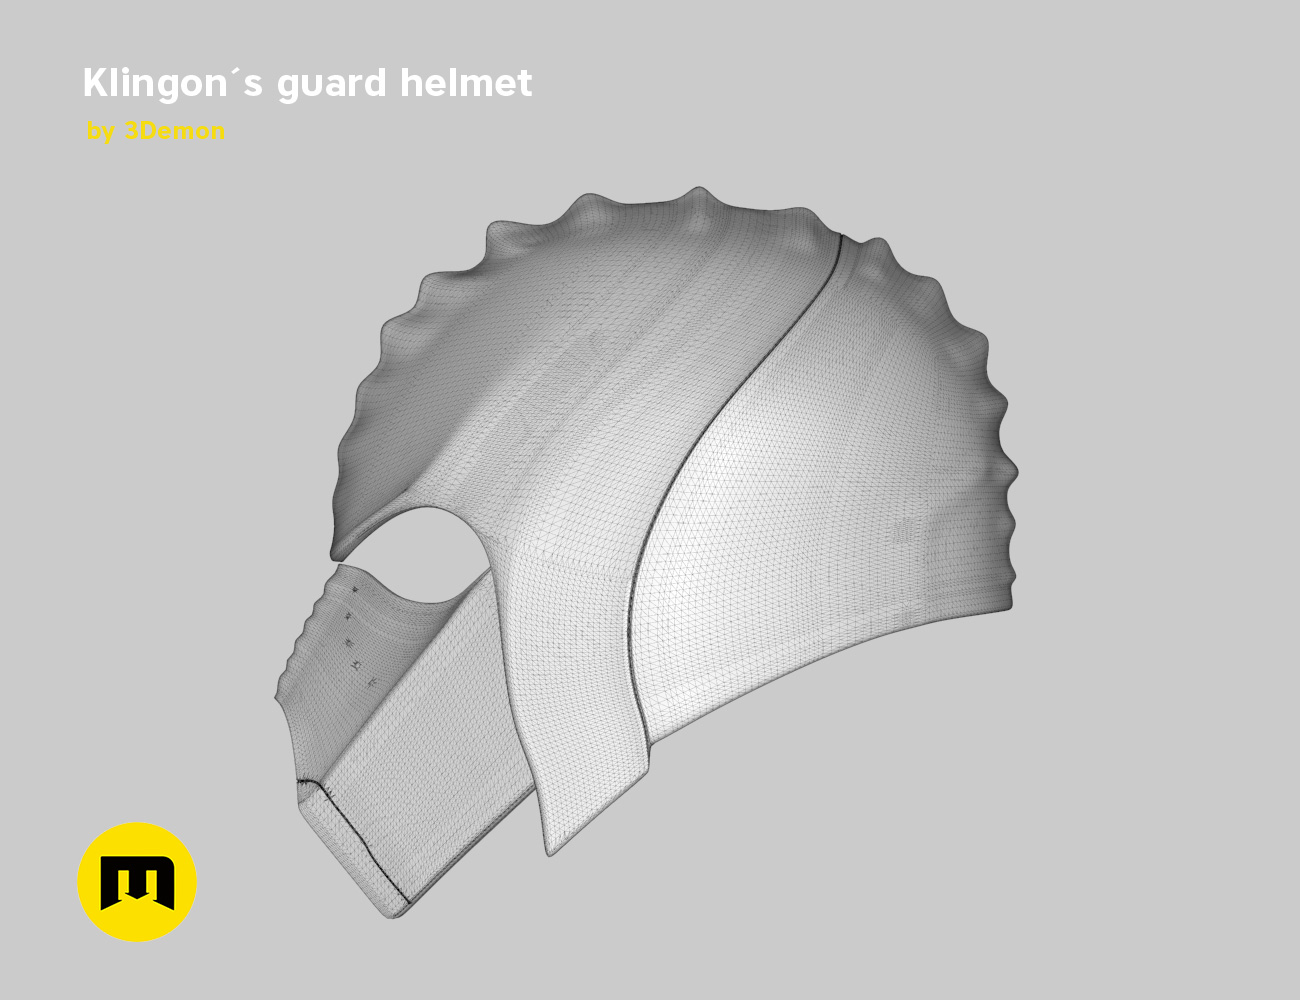 render_klingon_mesh.46.jpg Download STL file Klingon guard helmet • 3D printer object, 3D-mon